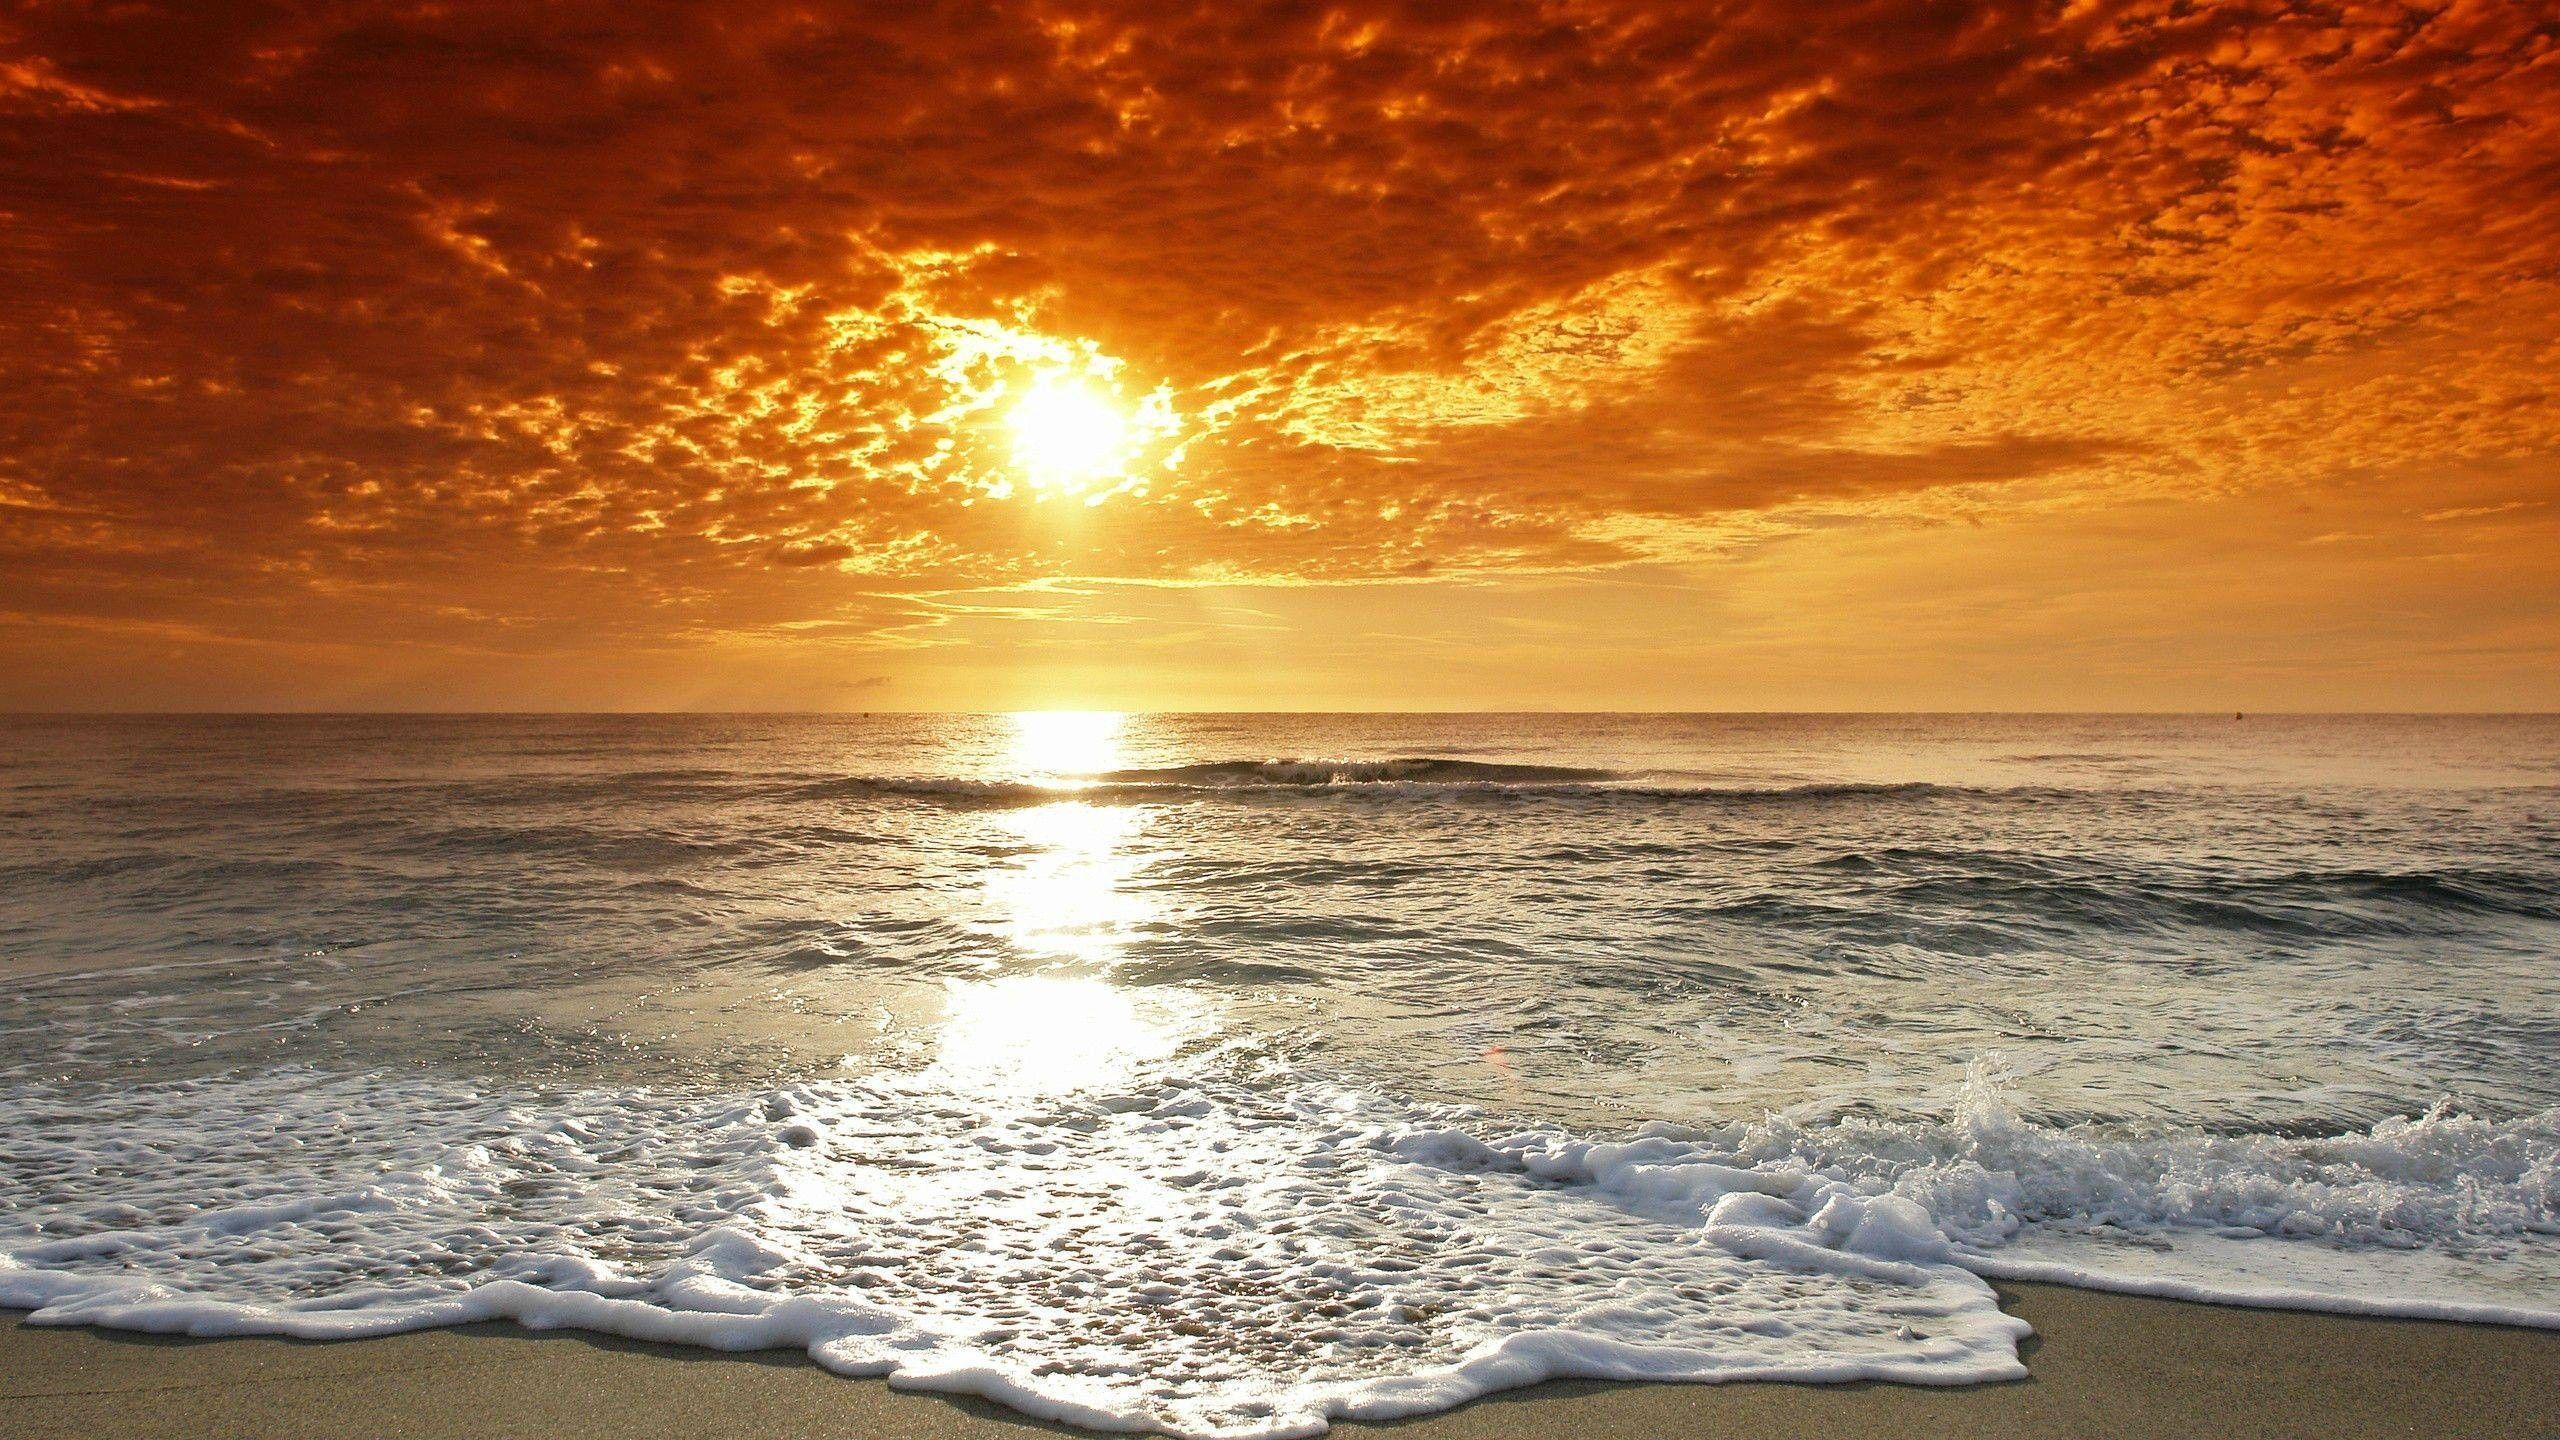 Sunrise Beach Wallpapers